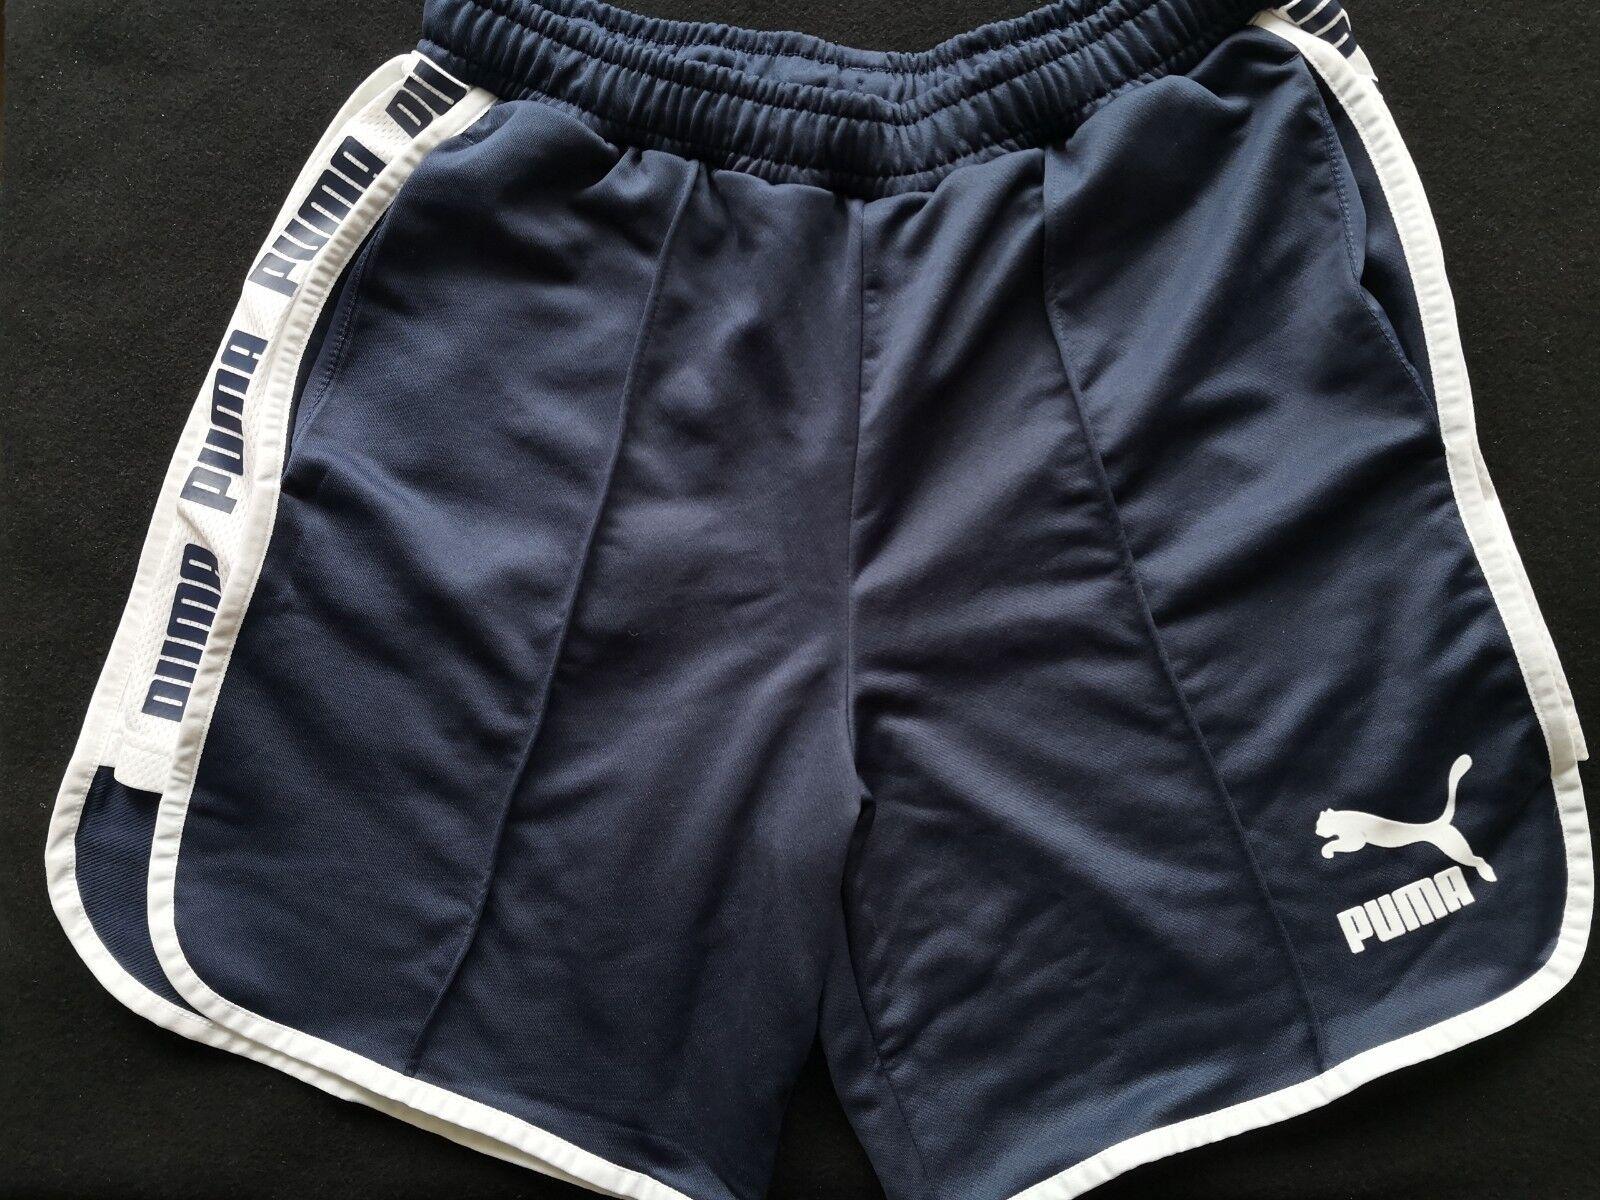 Puma Retro Vintage Like PREMIUM Shorts Dark bluee NAVY Size S Brand NEW 575219 06